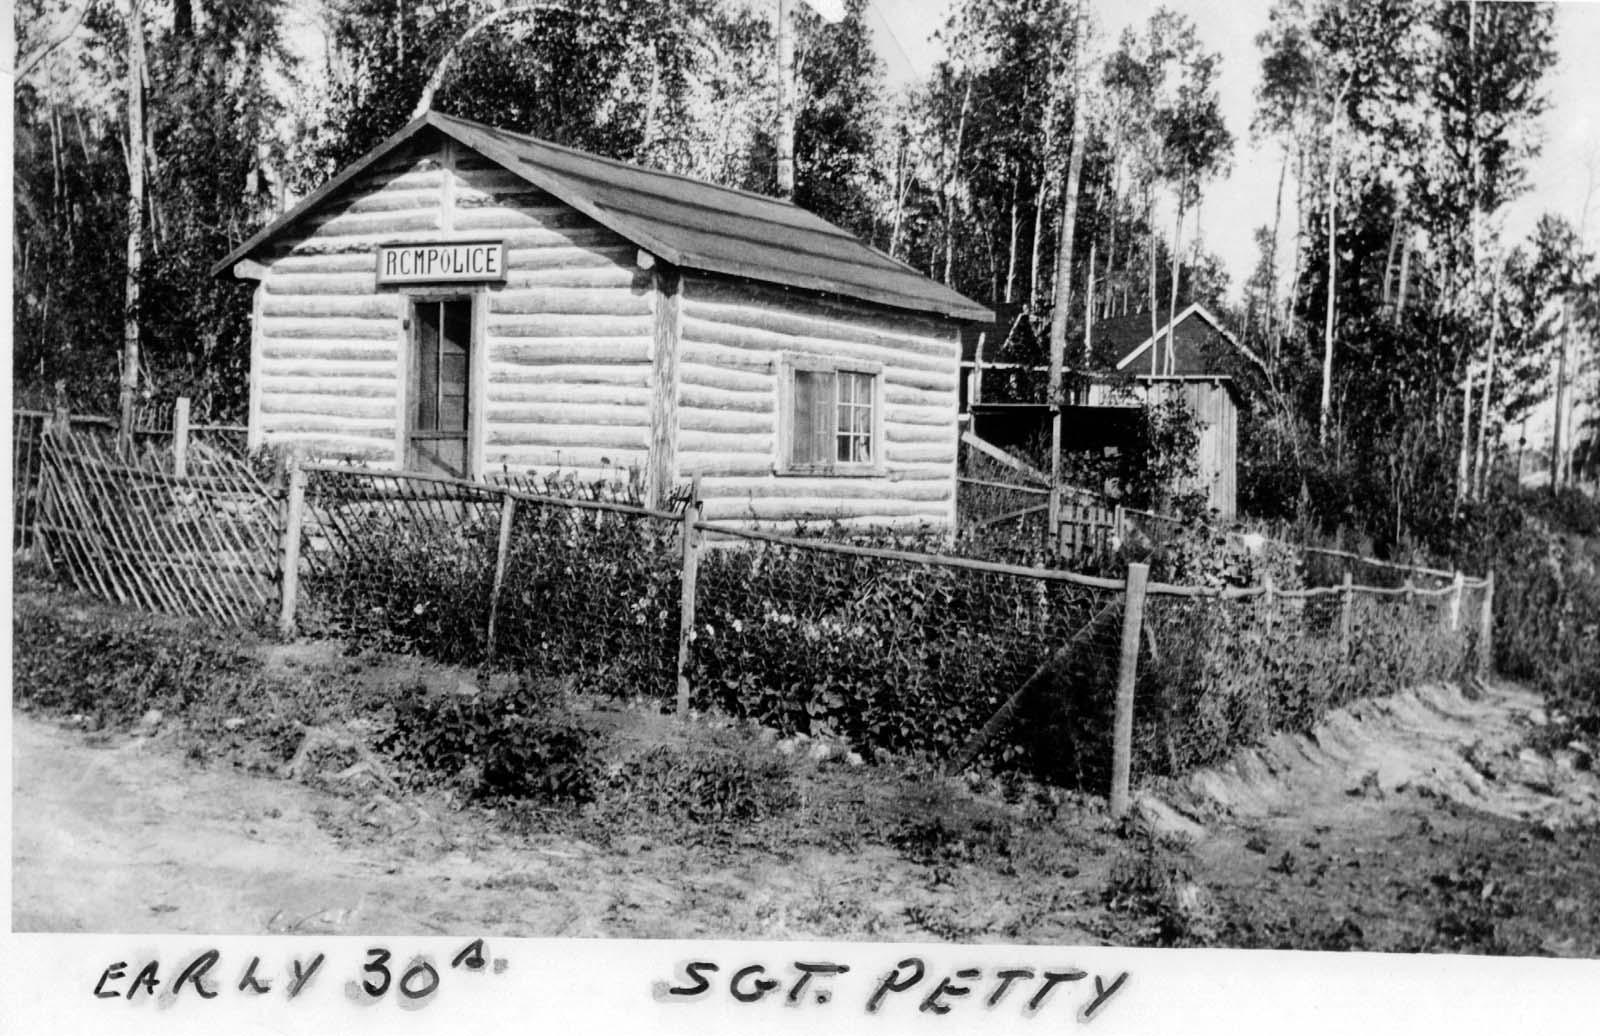 rcmp-sgt-petty-31